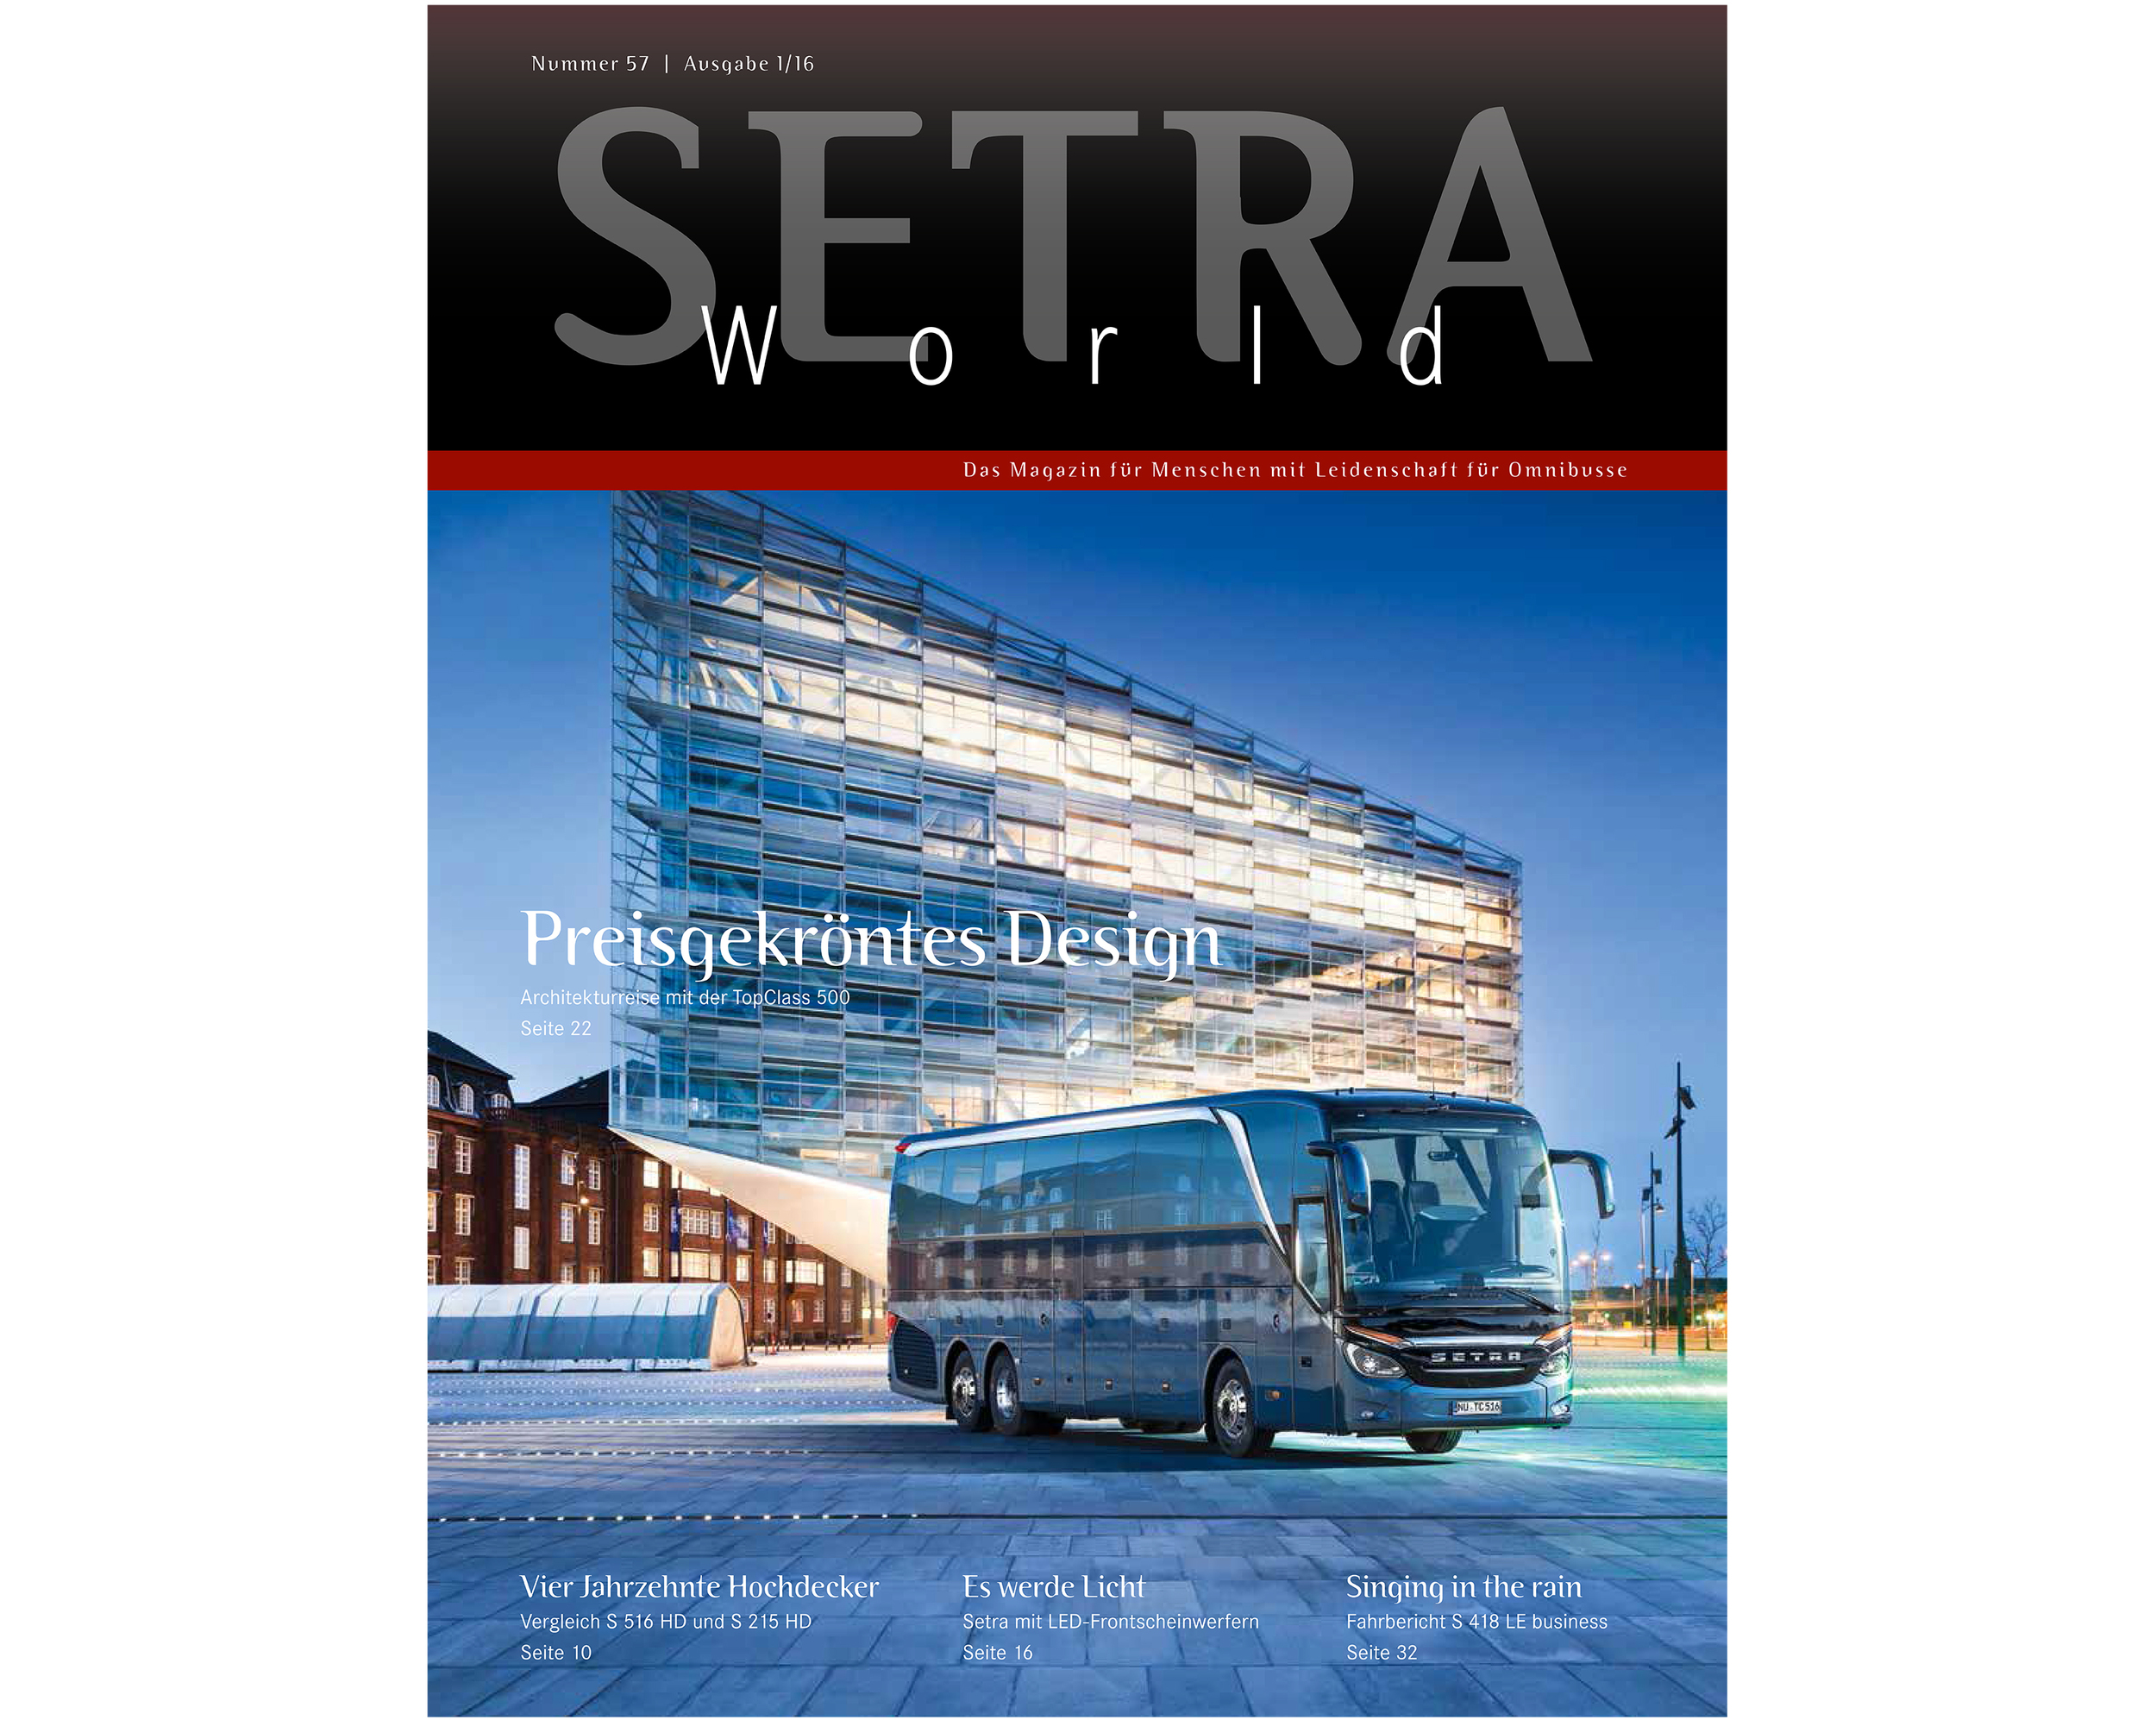 Setra_World_cover_05.jpg